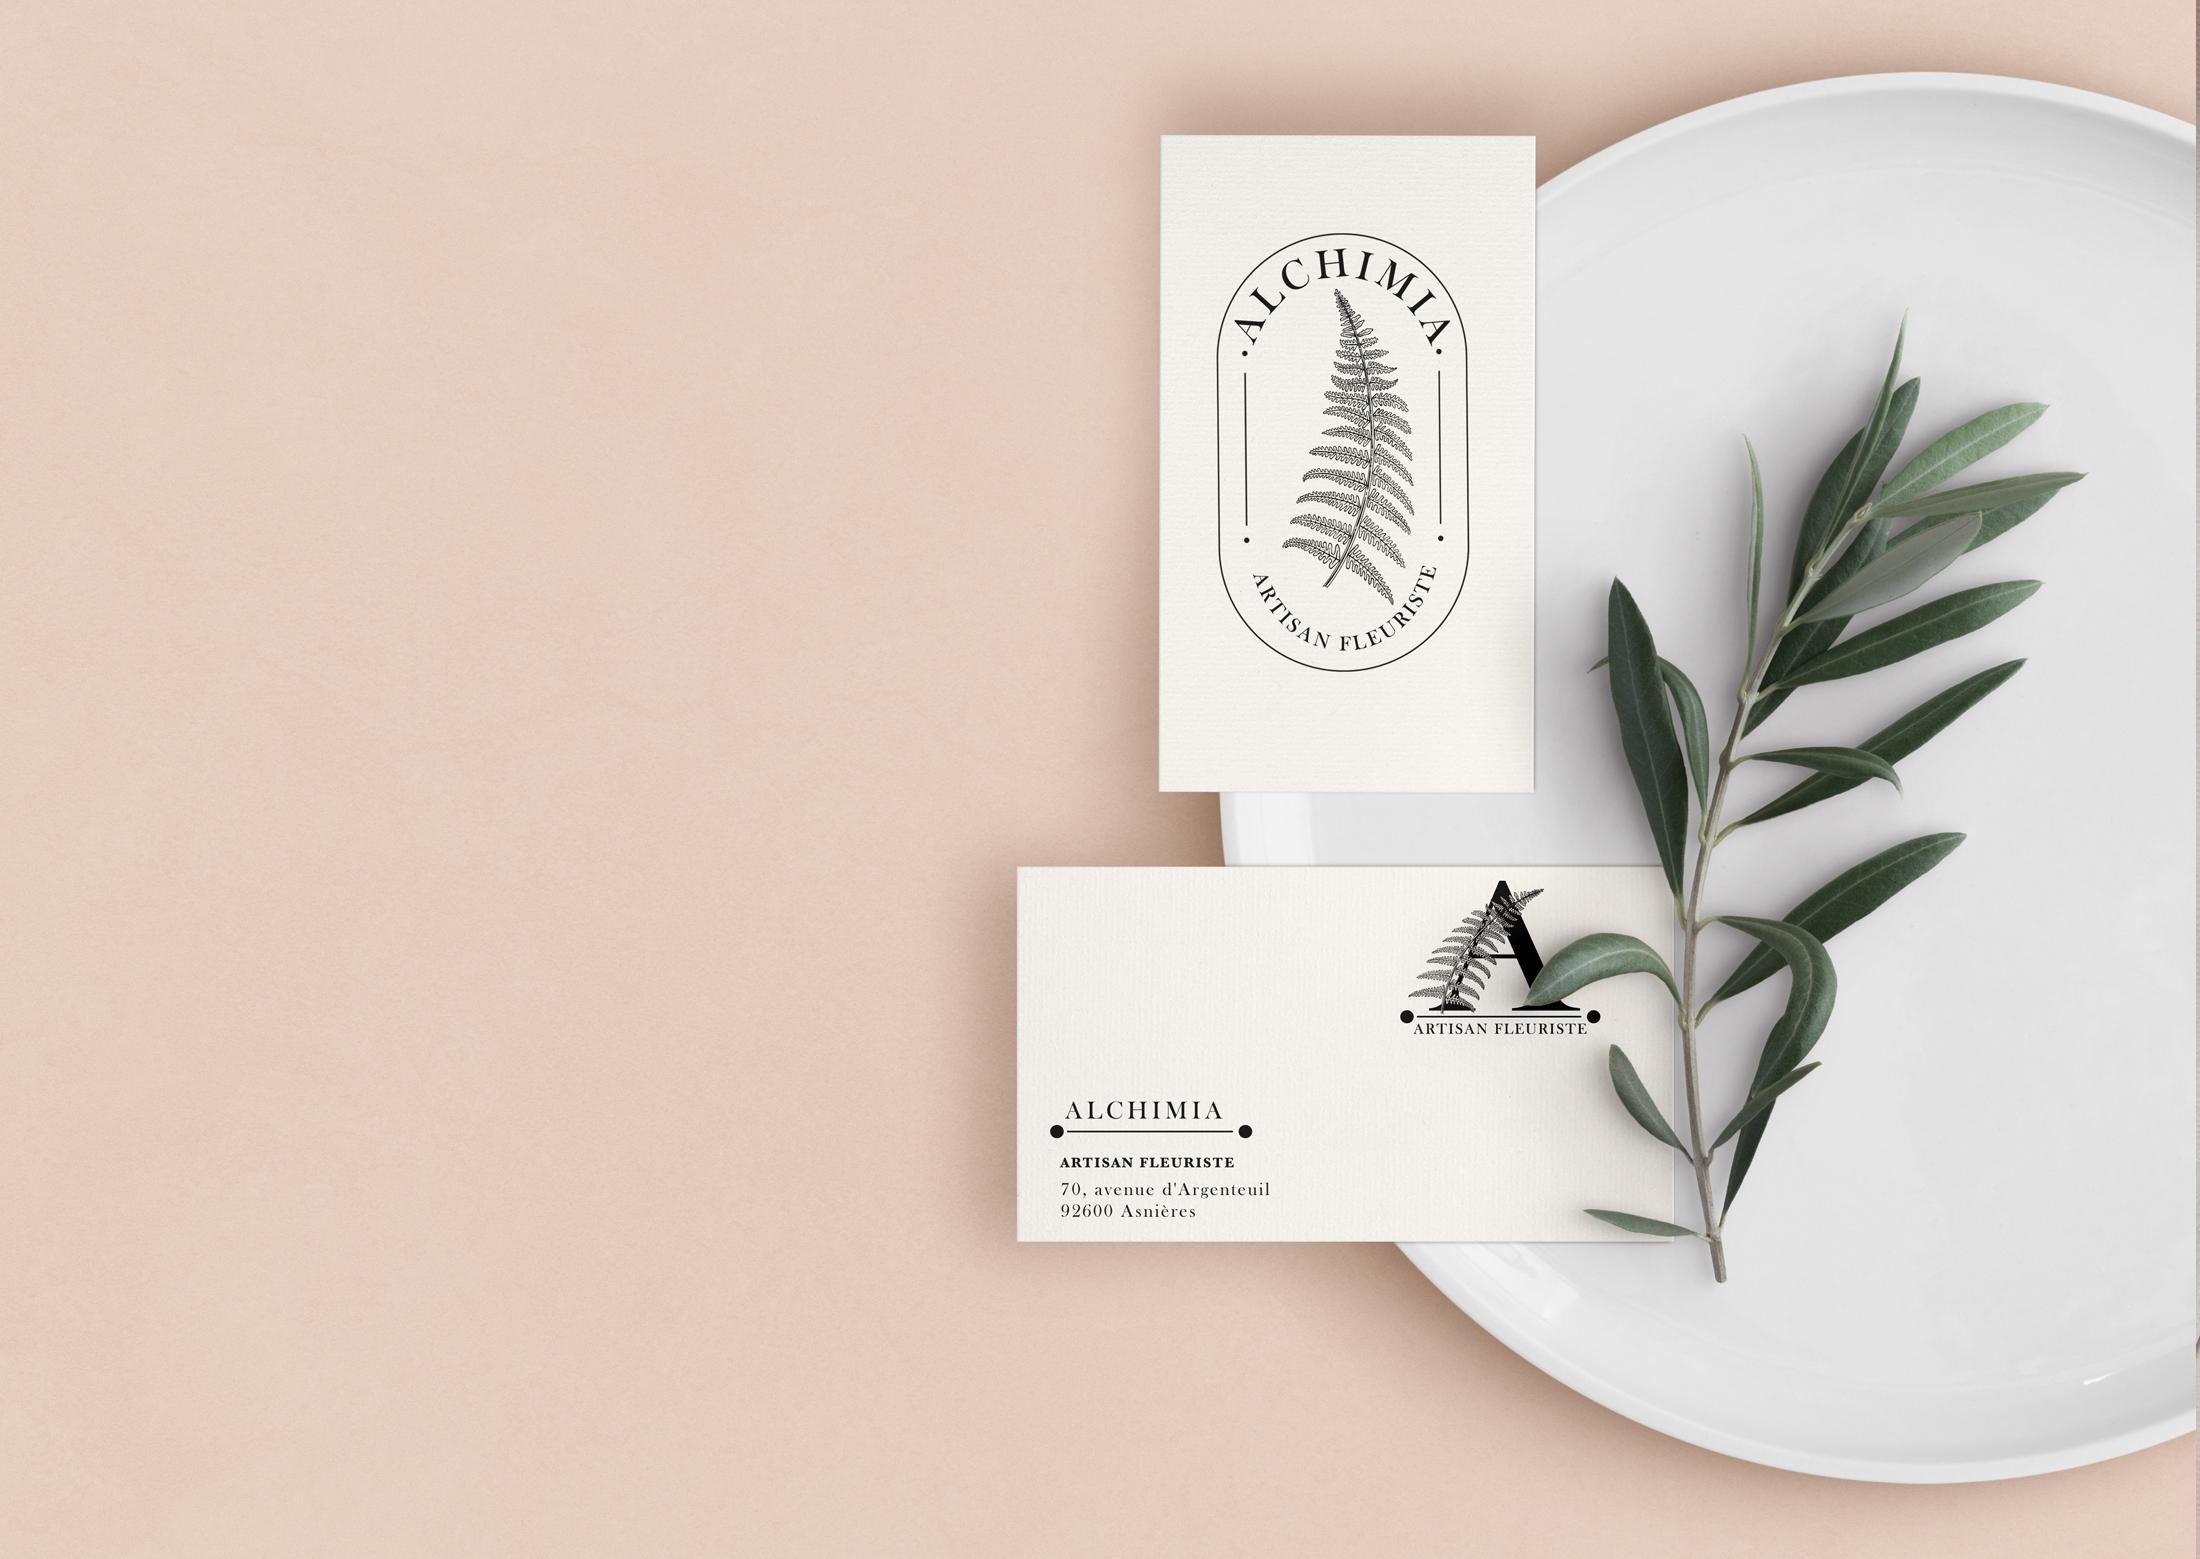 Branding marque alchimia Chic Studio